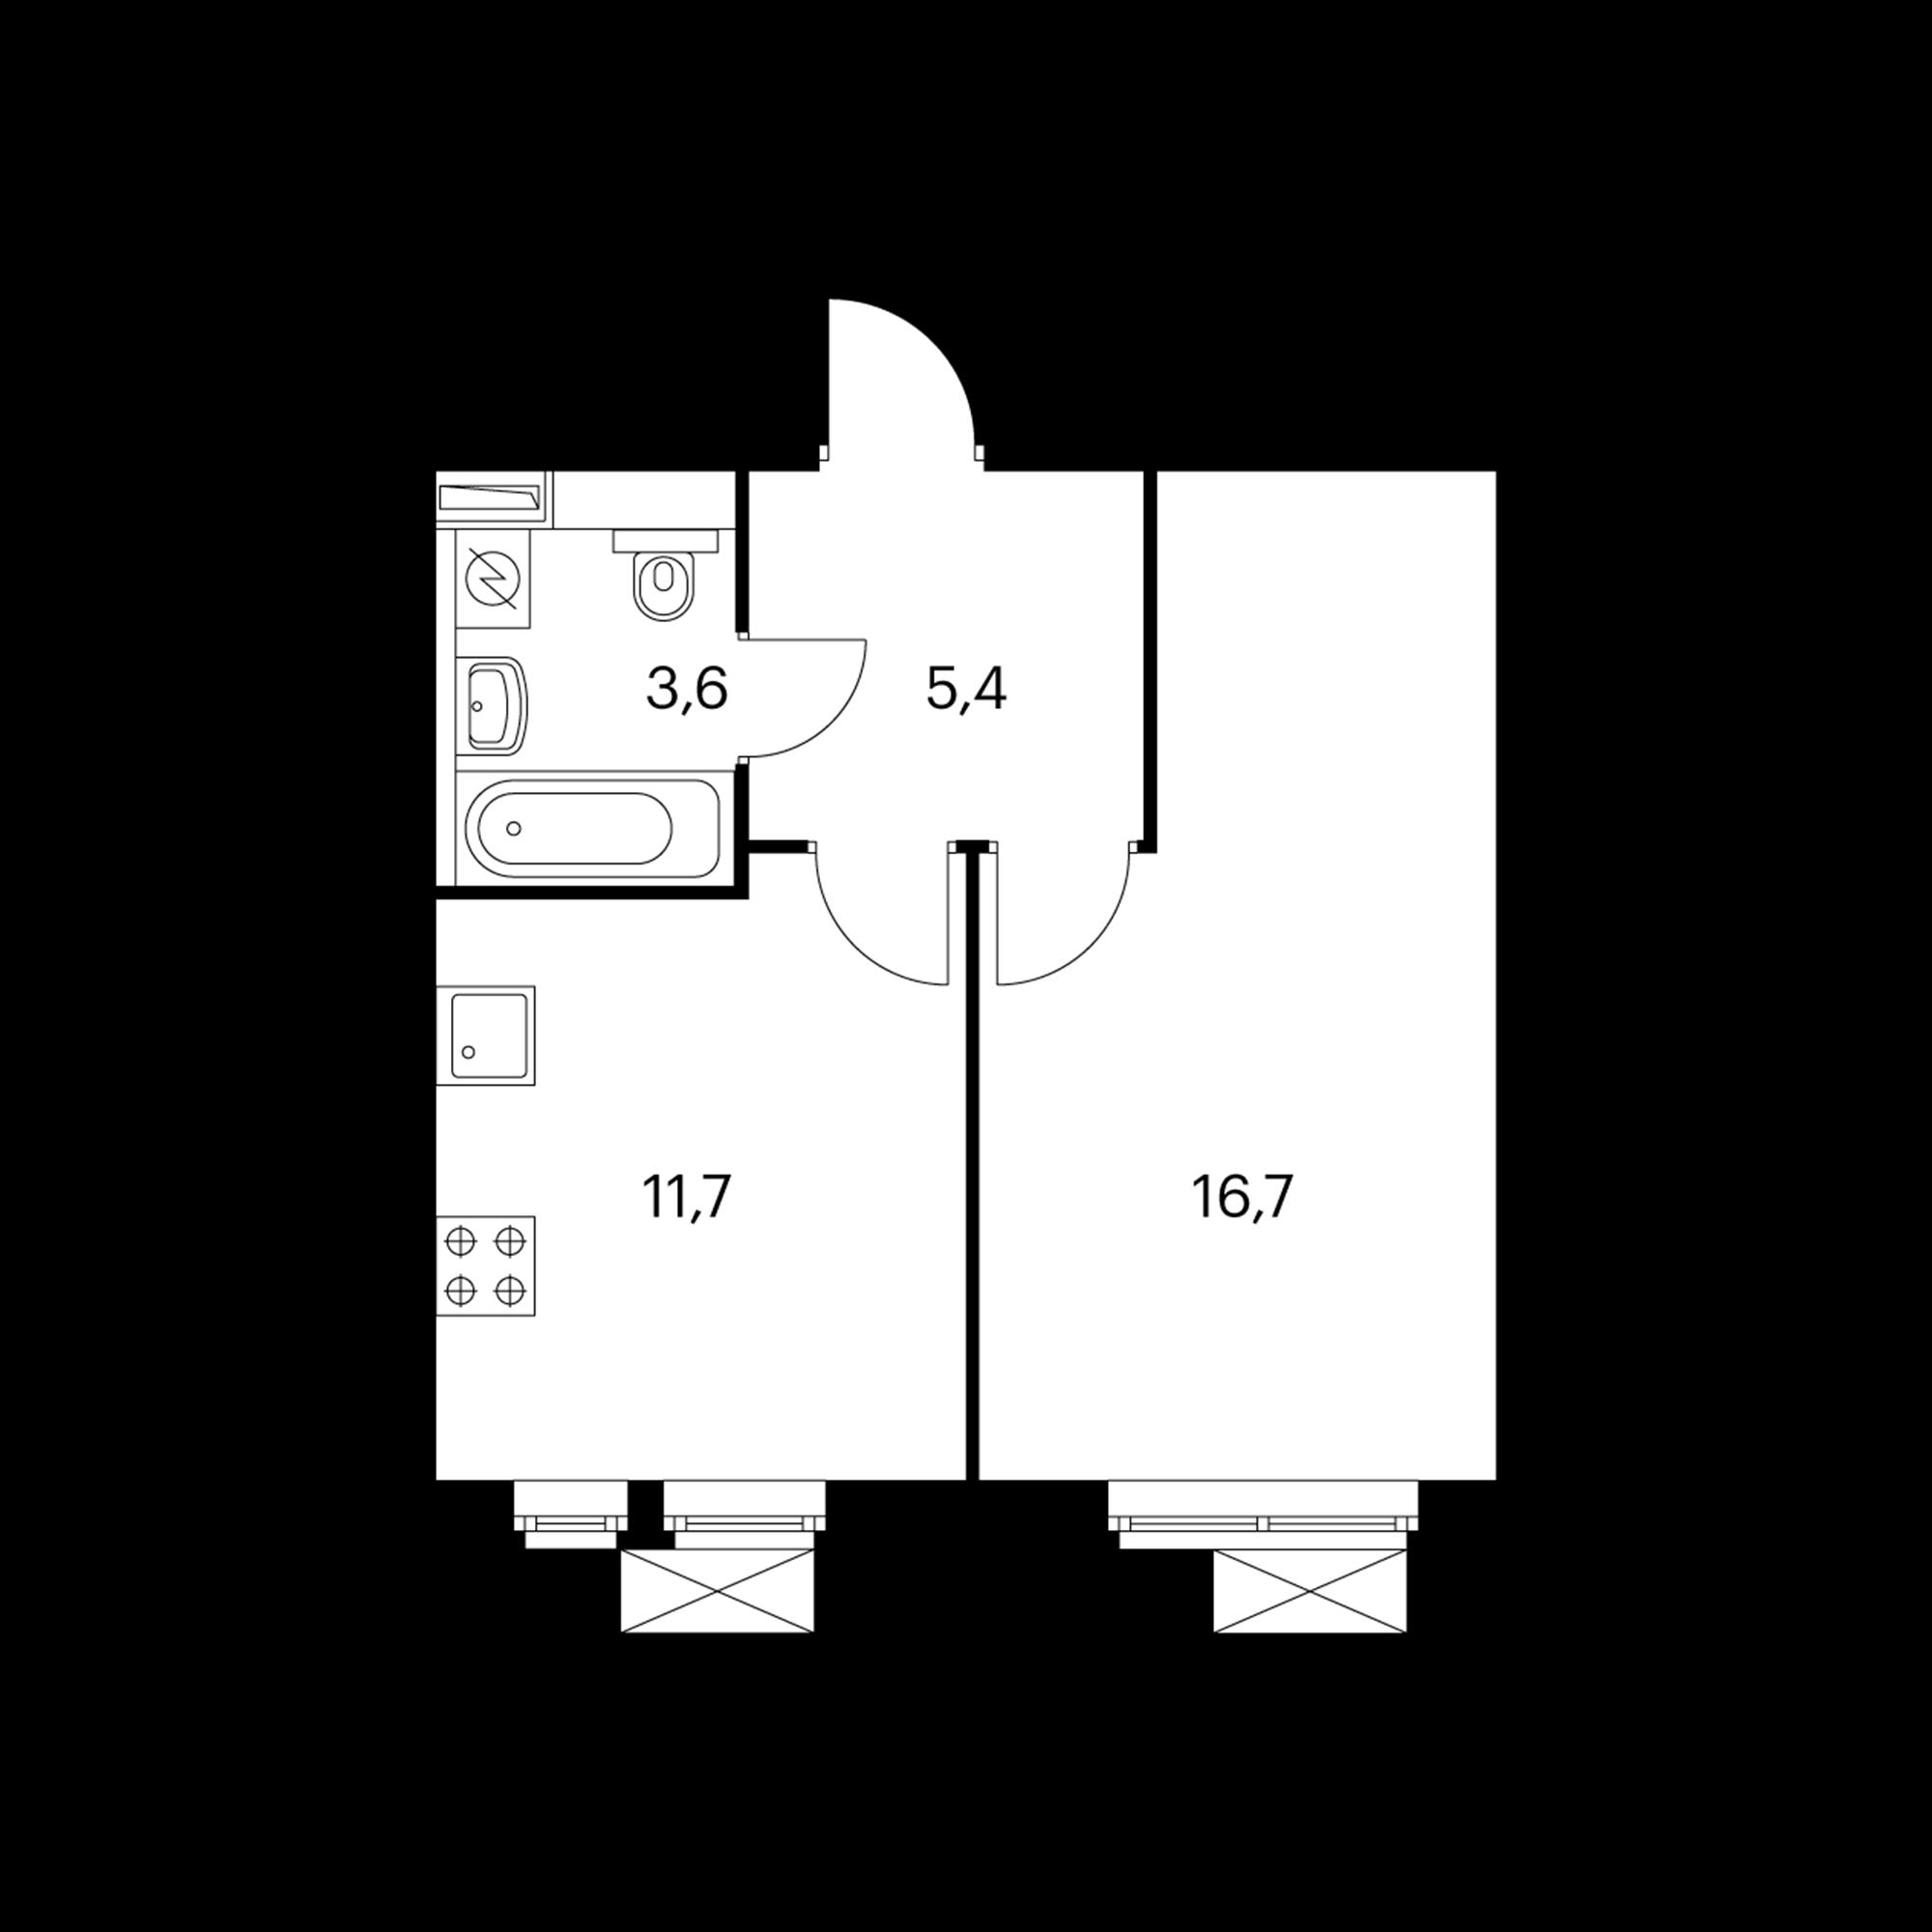 1KM1_6.6-1_S_Z